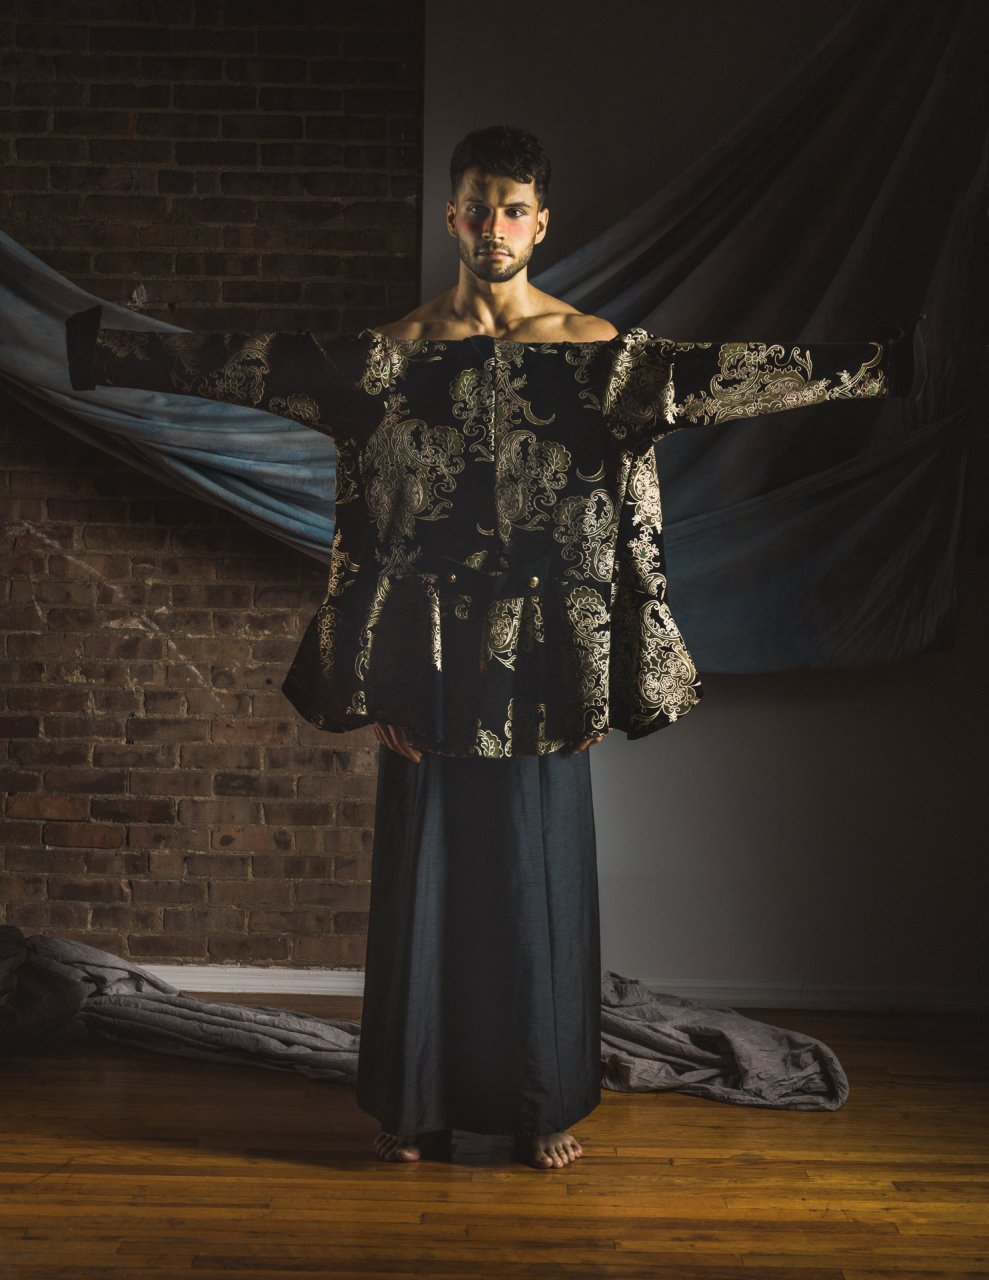 Stone_Zhu -Le mannequin Rudy Bundini